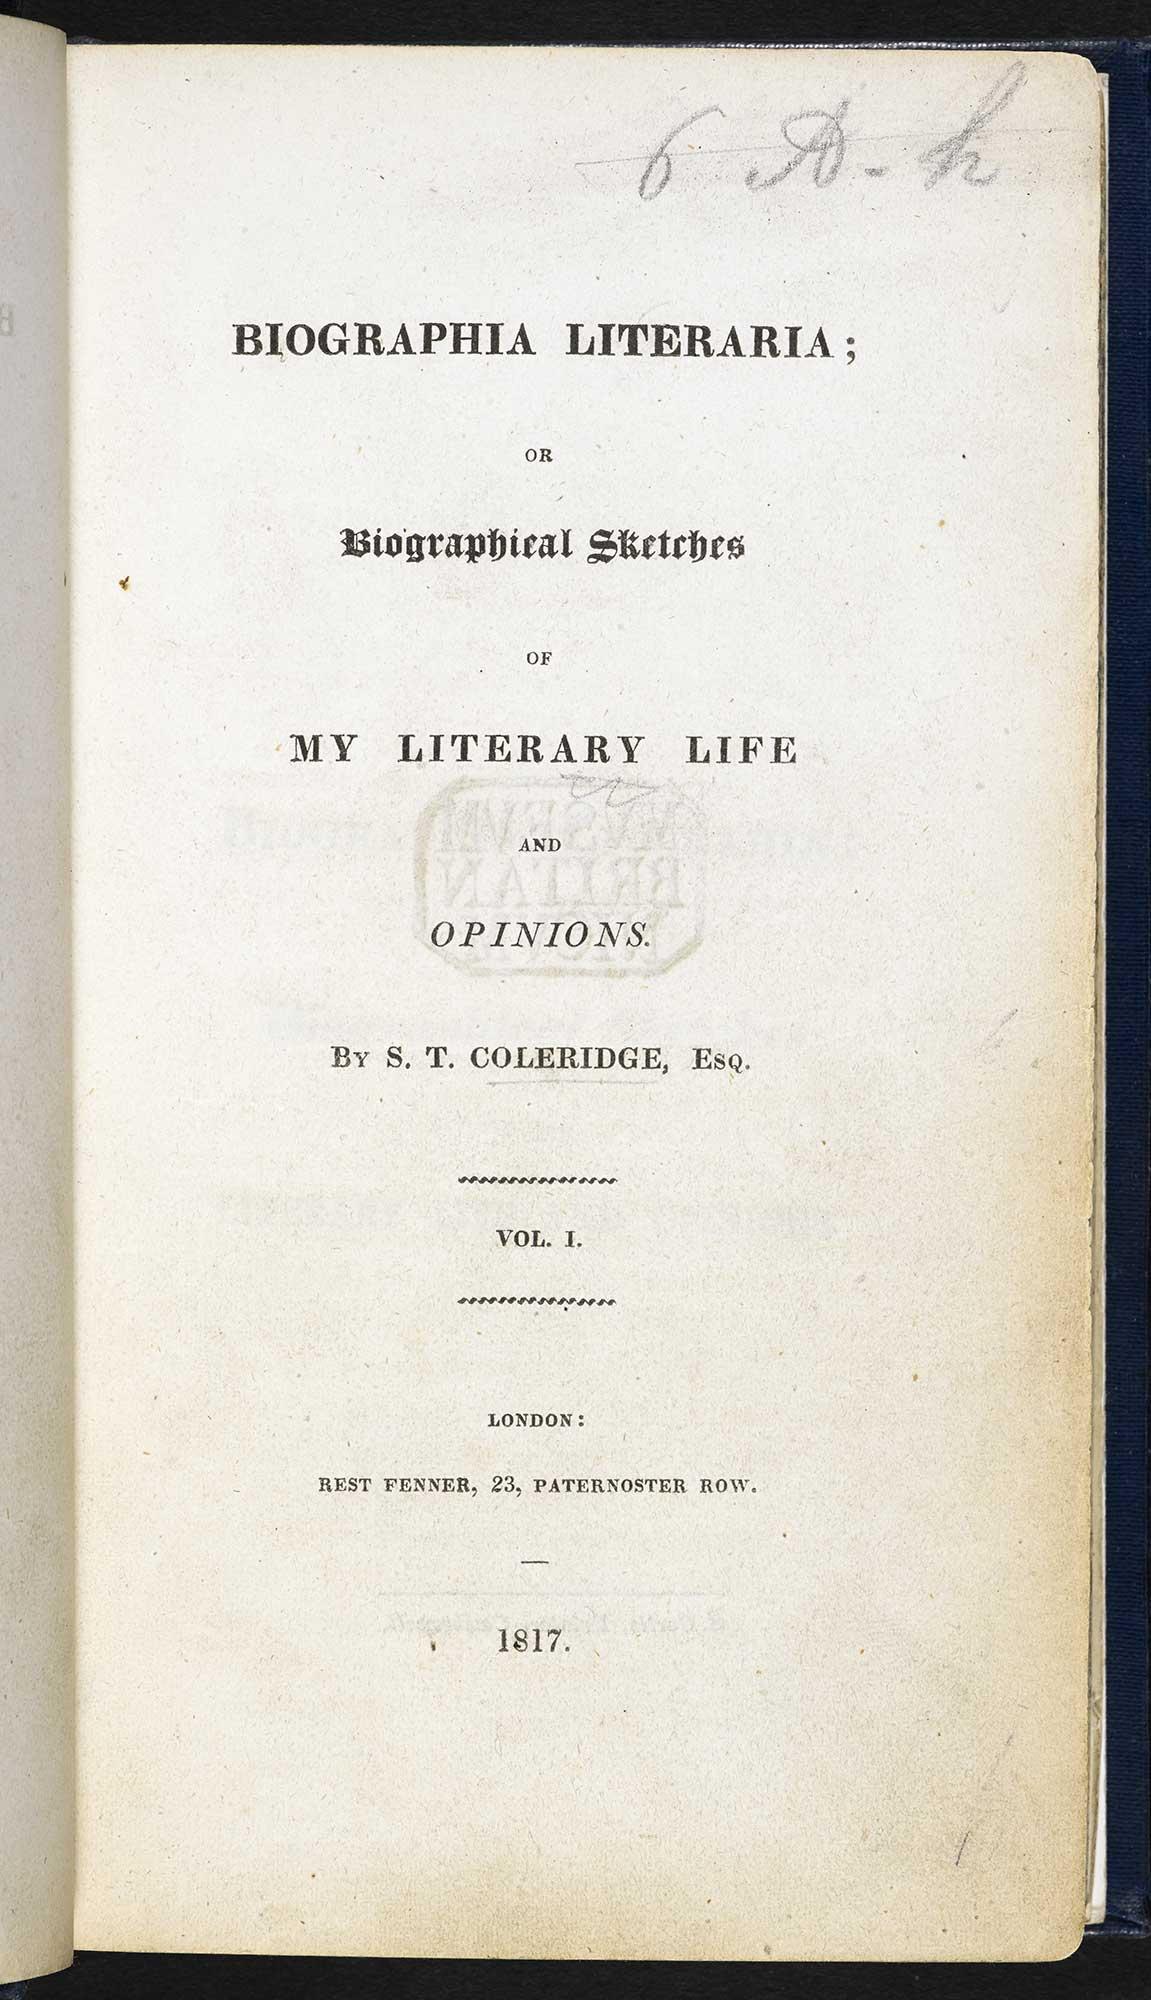 Biographia Literaria By Samuel Taylor Coleridge The British Library